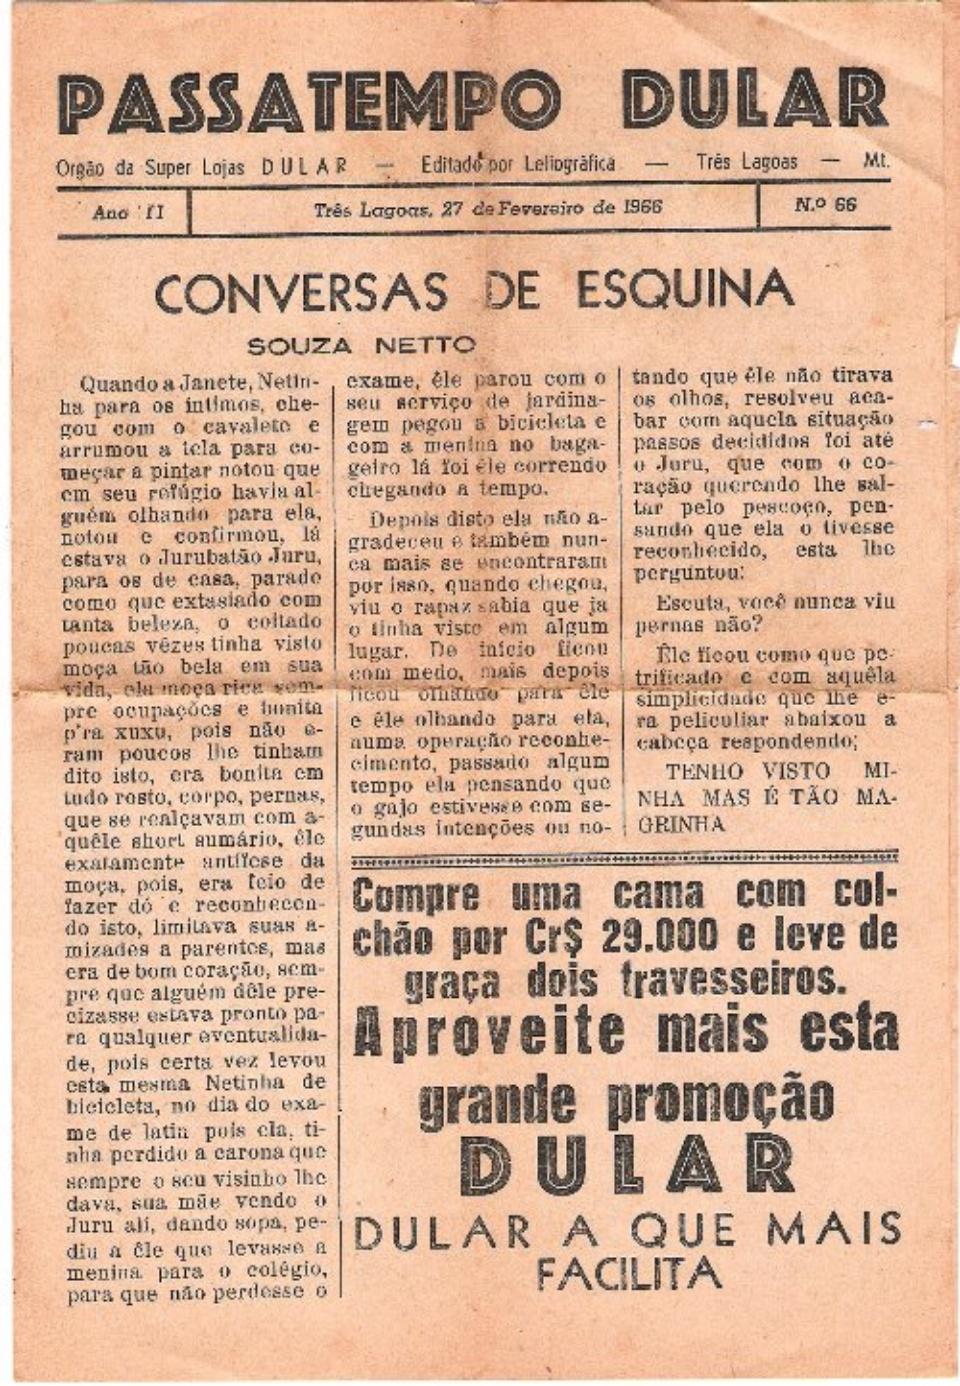 03. PASSATEMPO DULAR - 06.06.1965 a 27.02.1966